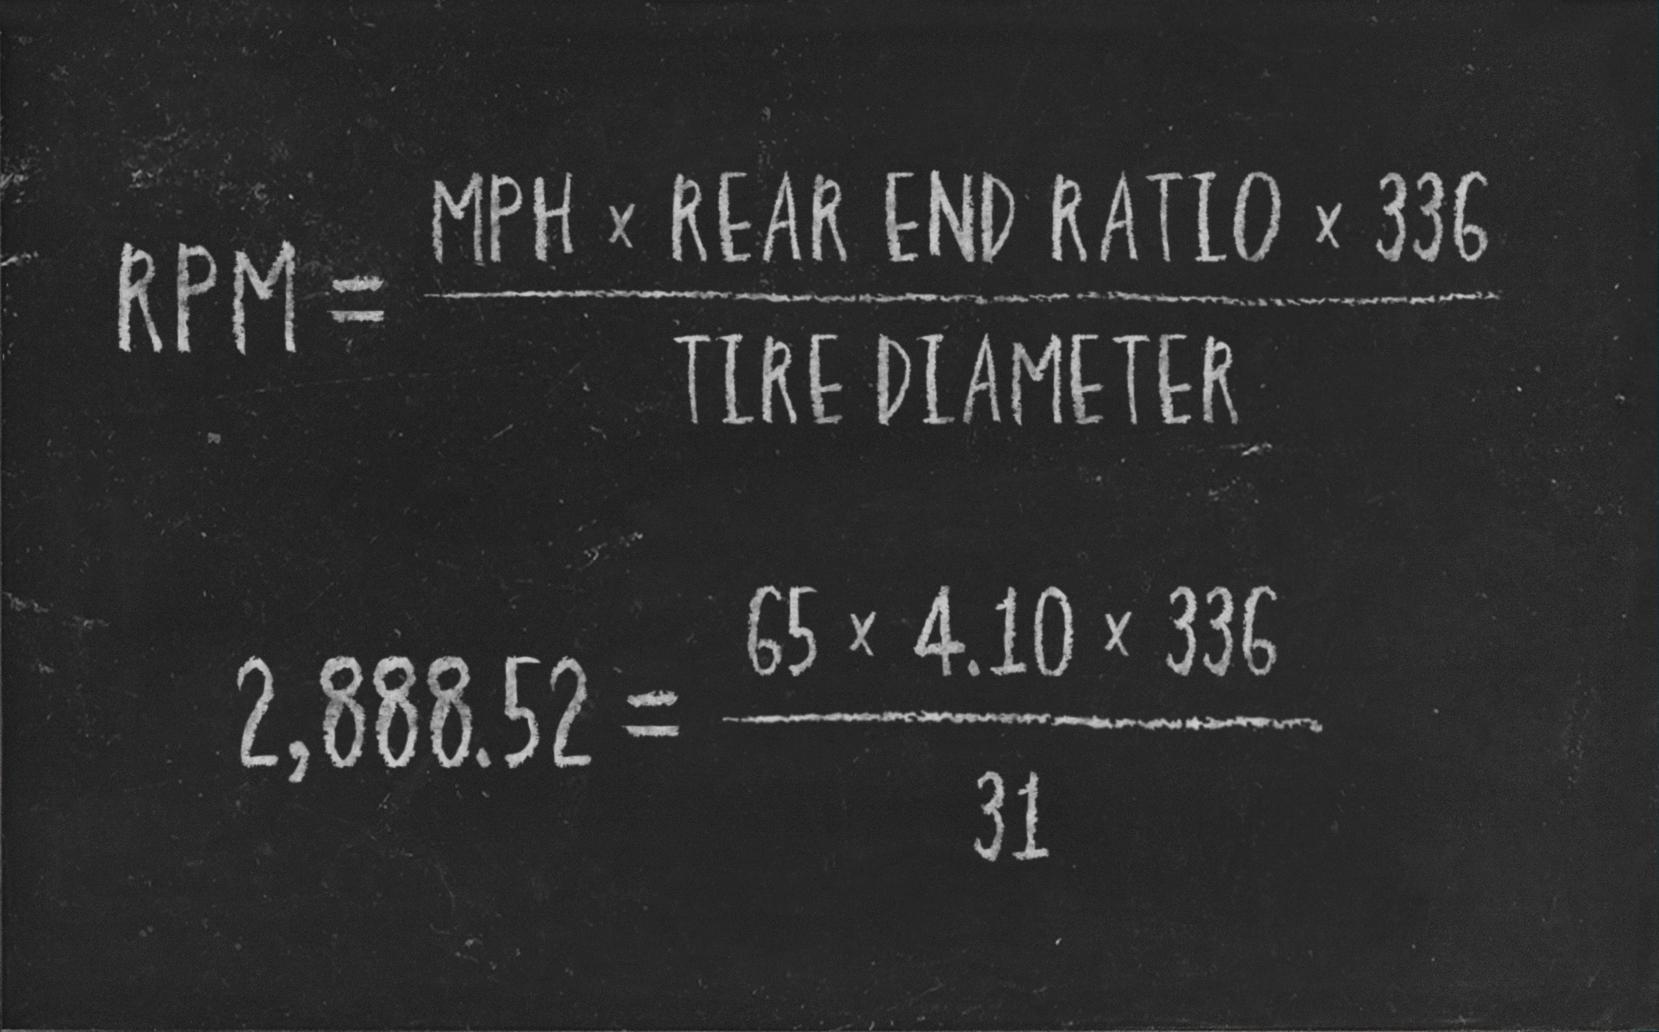 Rpmmphgear Ratio 3